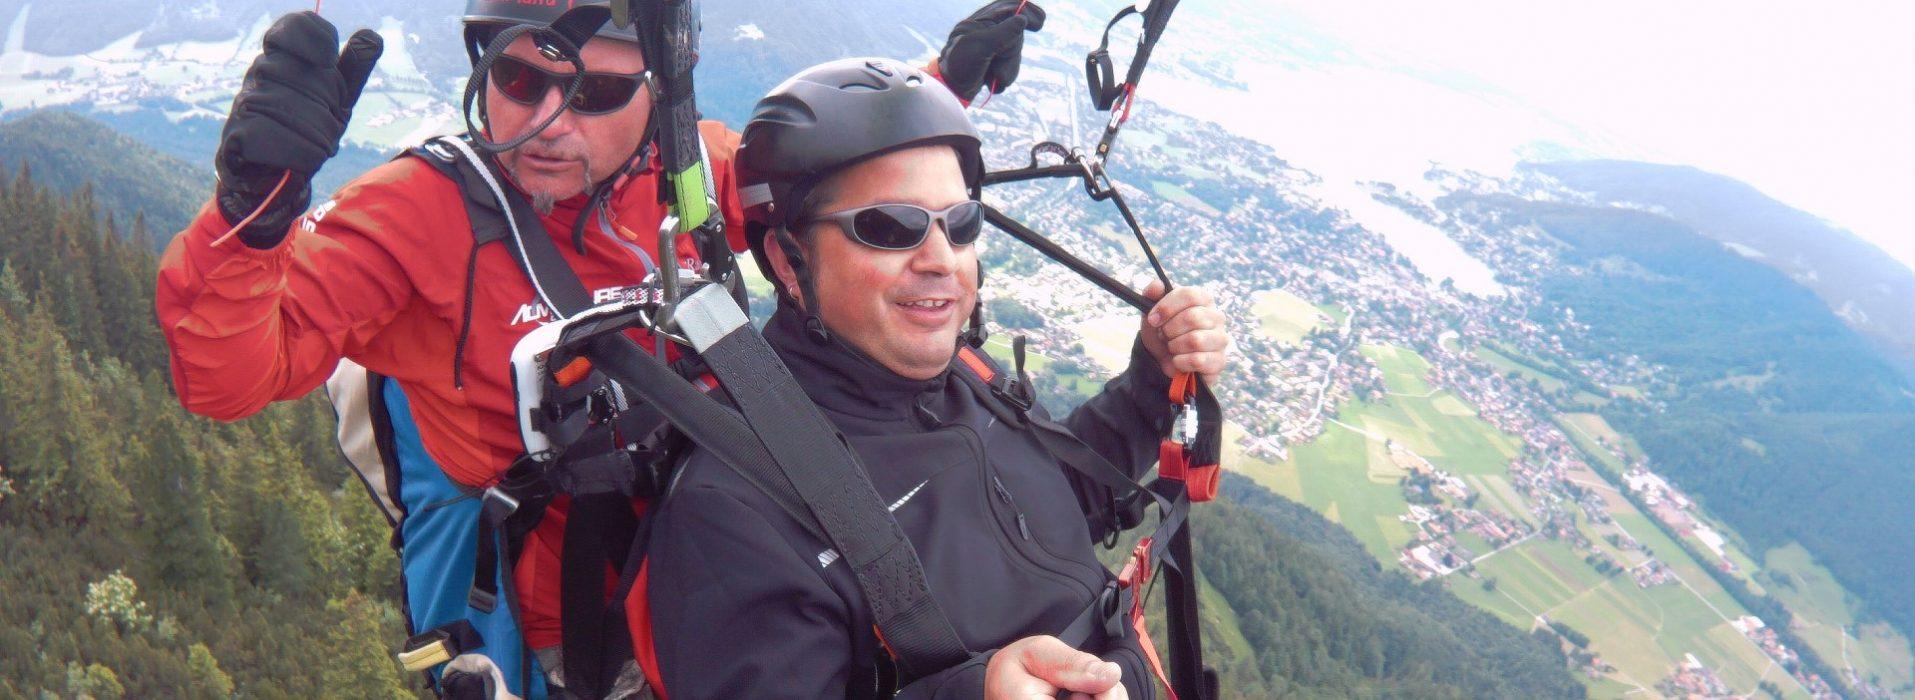 Gleitschirm Tandemflug am Tegernsee